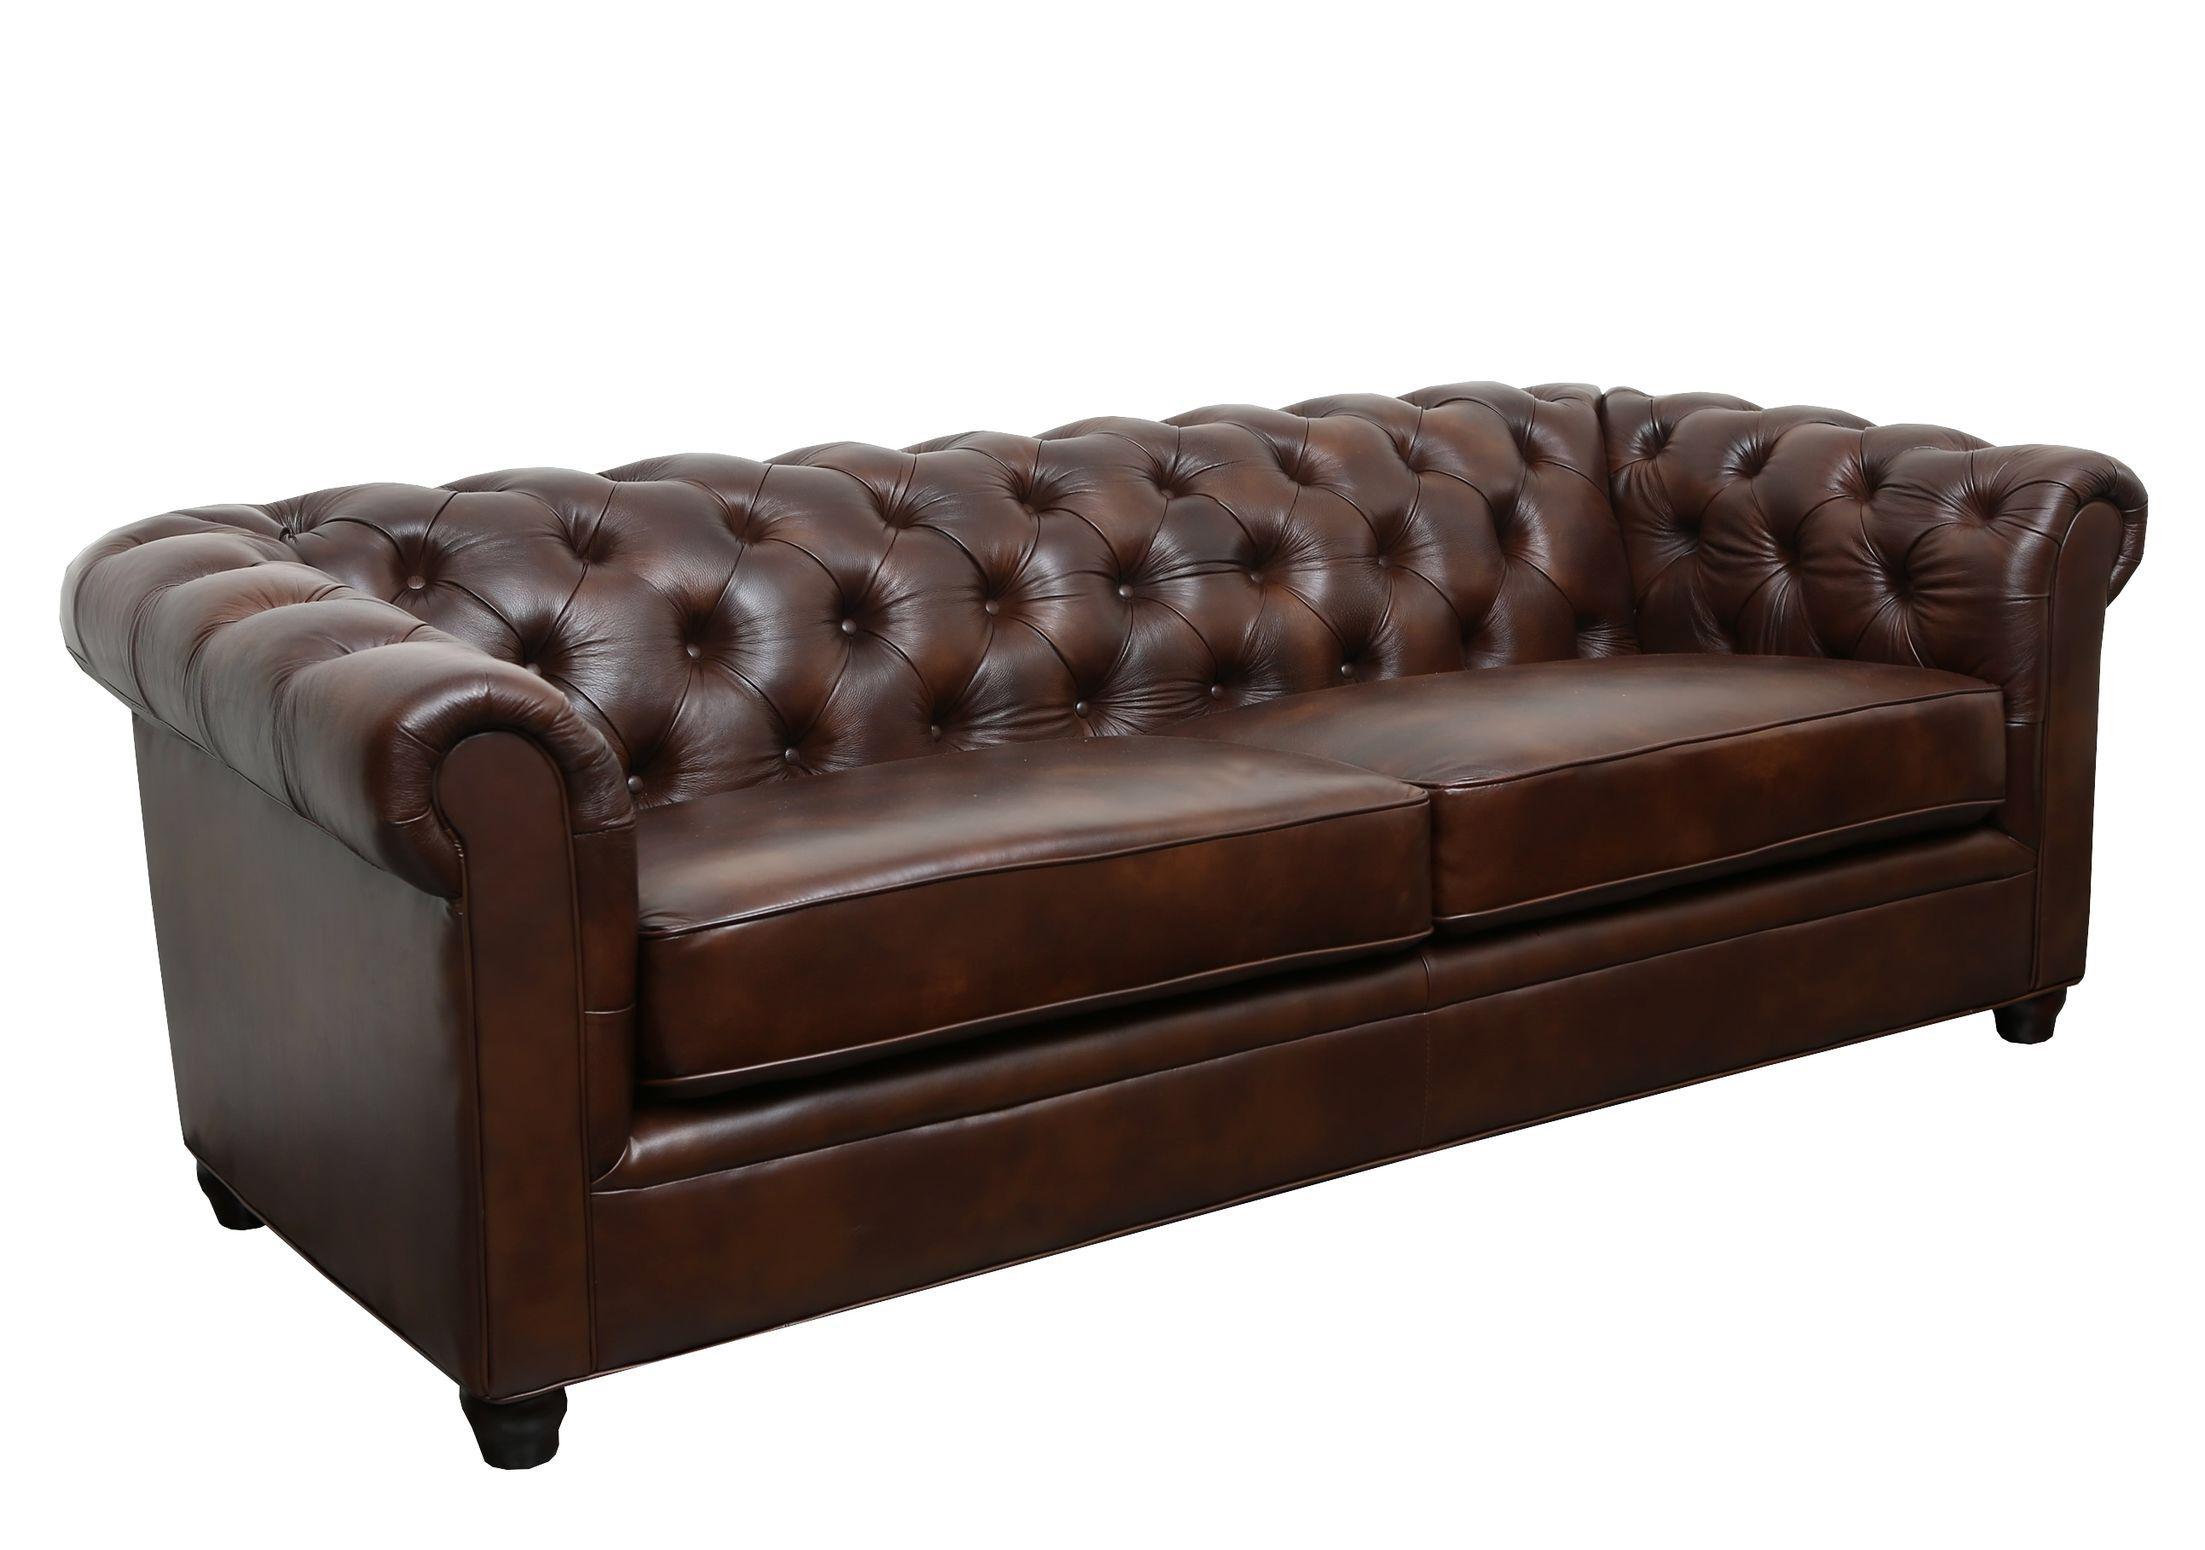 living room ideas with leather furniture%0A Foyer Premium Italian Leather Sofa